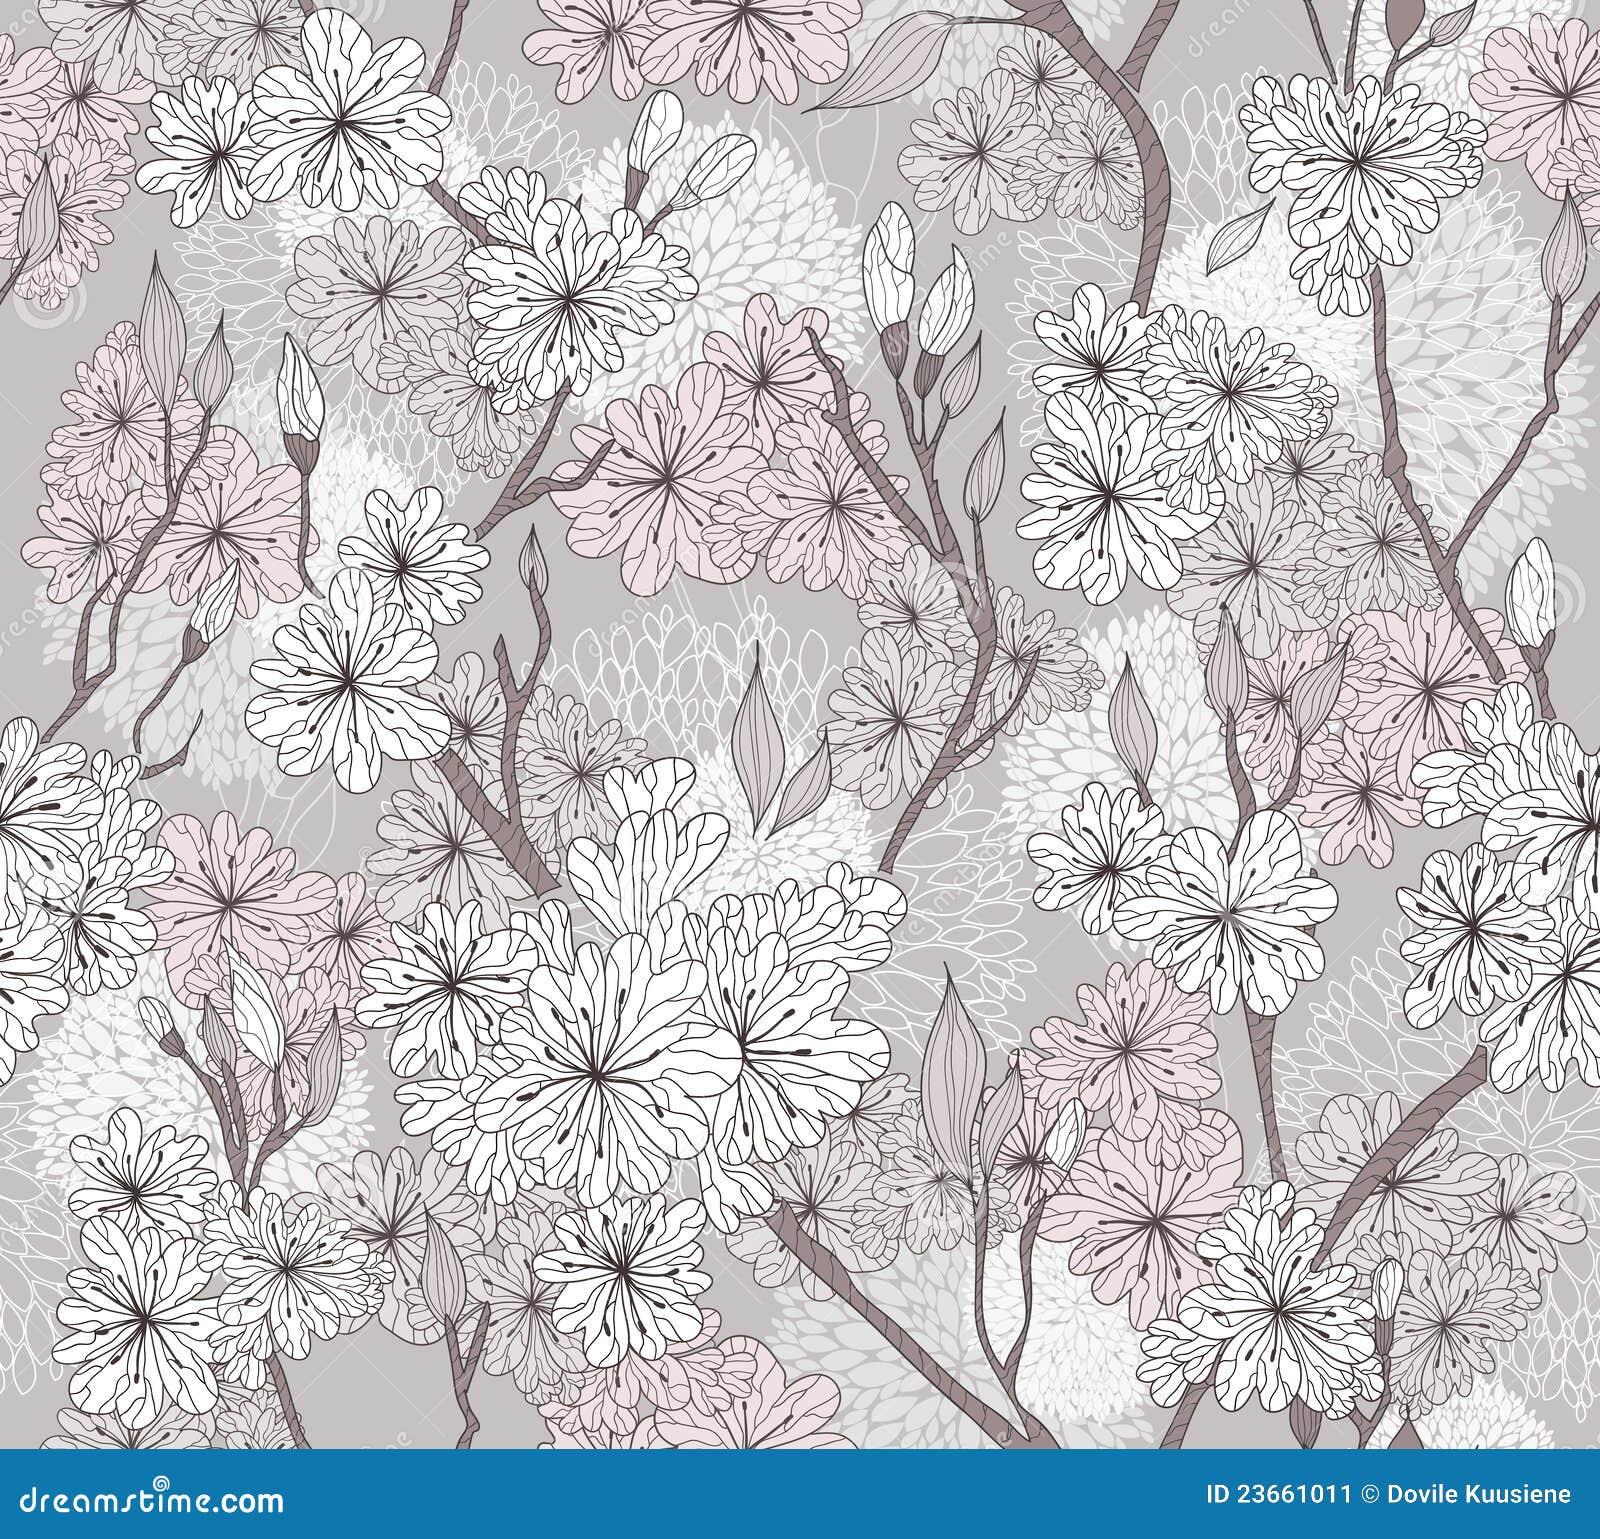 Cherry Blossom Flower Stencil: Seamless Cherry Blossom Flowers Pattern Stock Image